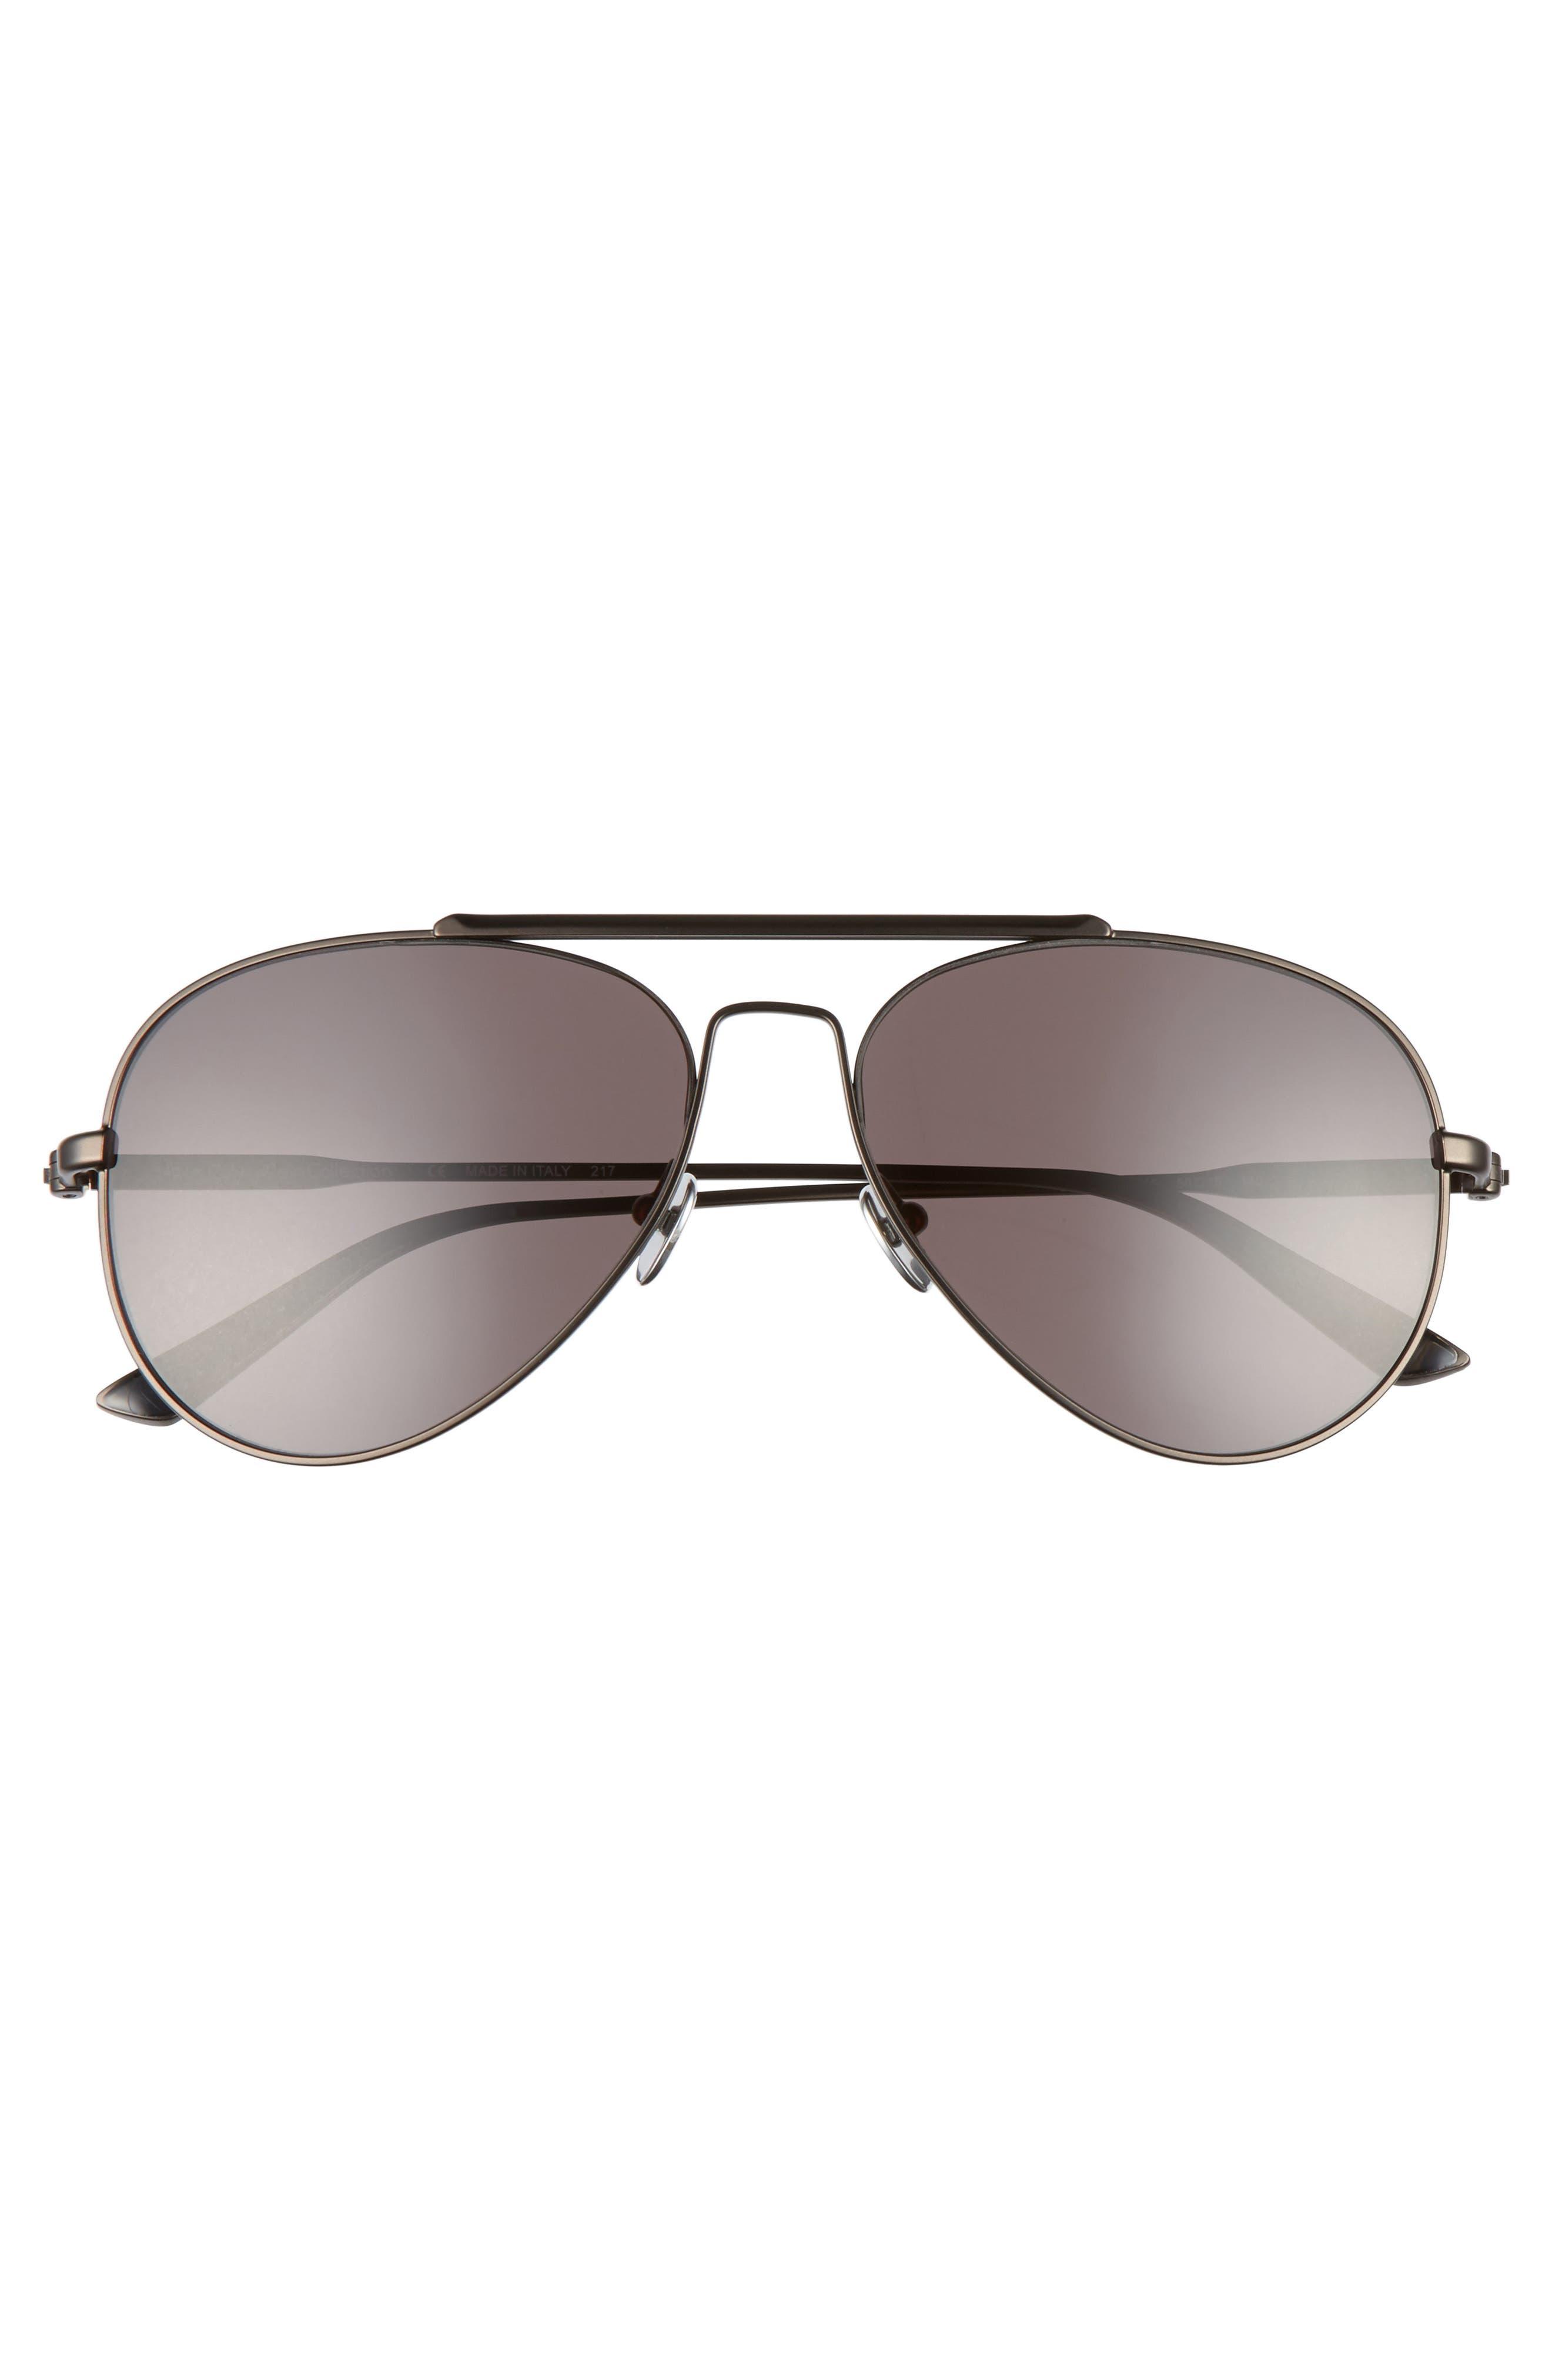 58mm Aviator Sunglasses,                             Alternate thumbnail 3, color,                             Satin Titanium